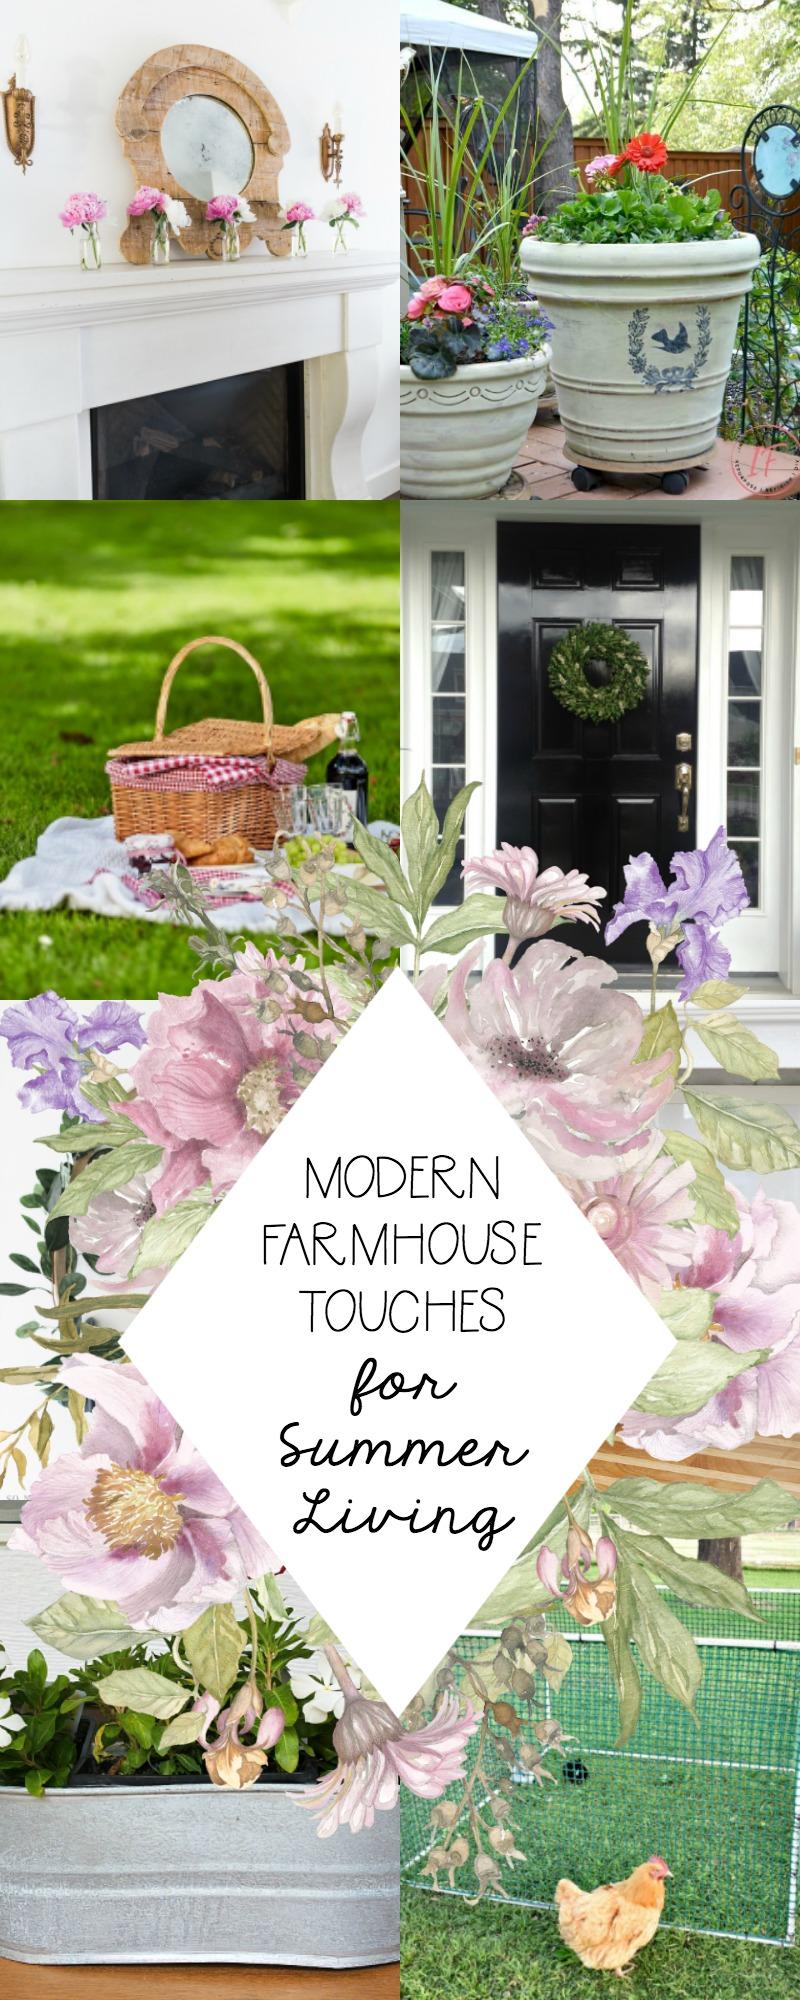 Modern Farmhouse Touches for Farmhouse Living